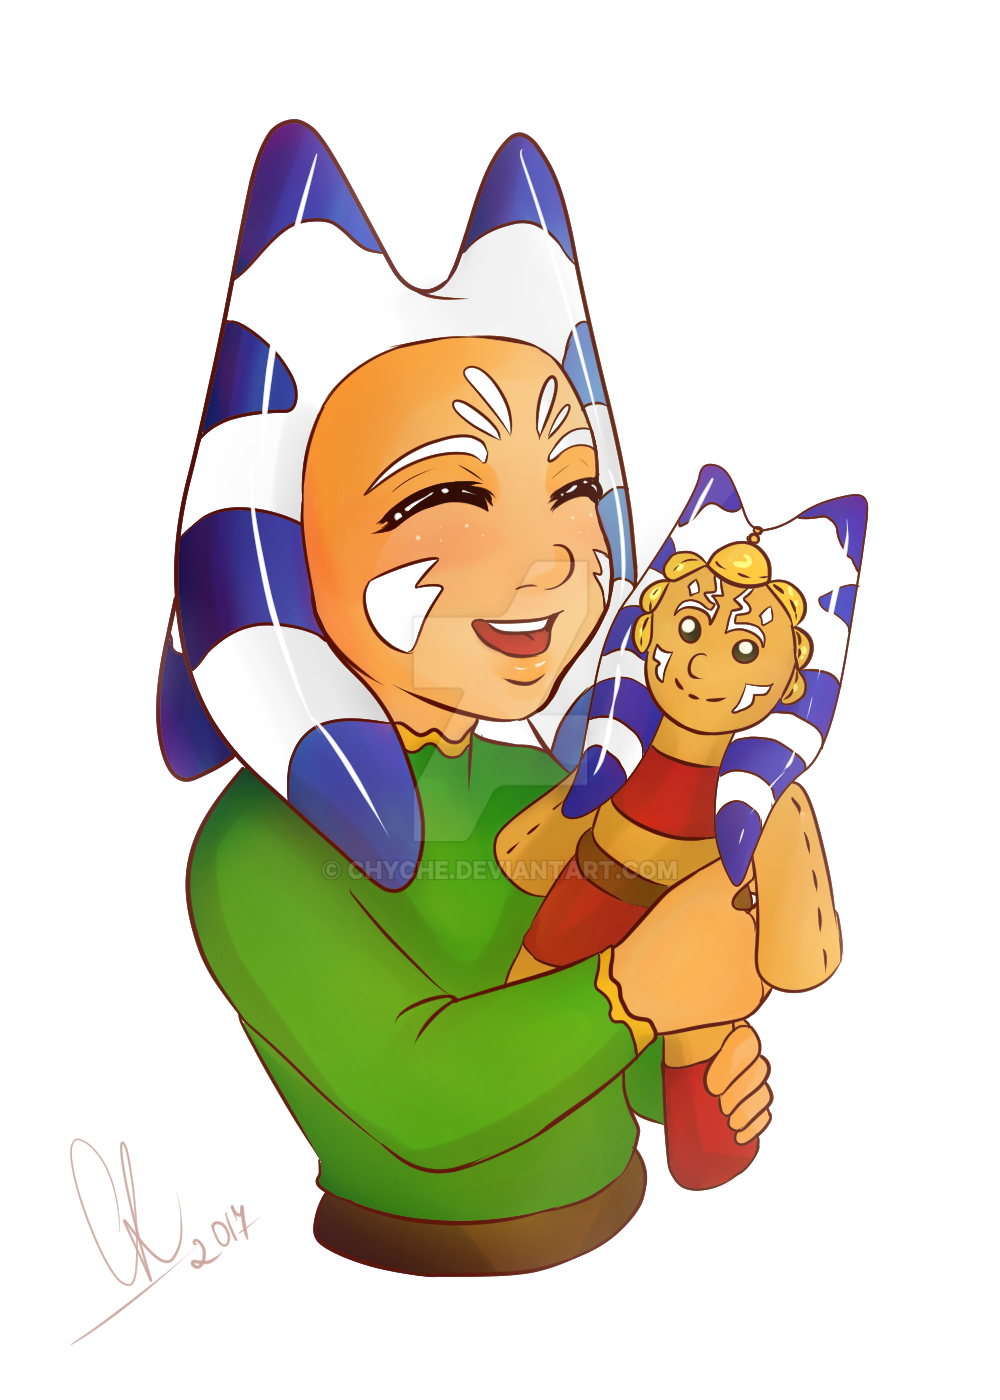 Erdeni Tano with Toy Ahsoka by Chyche